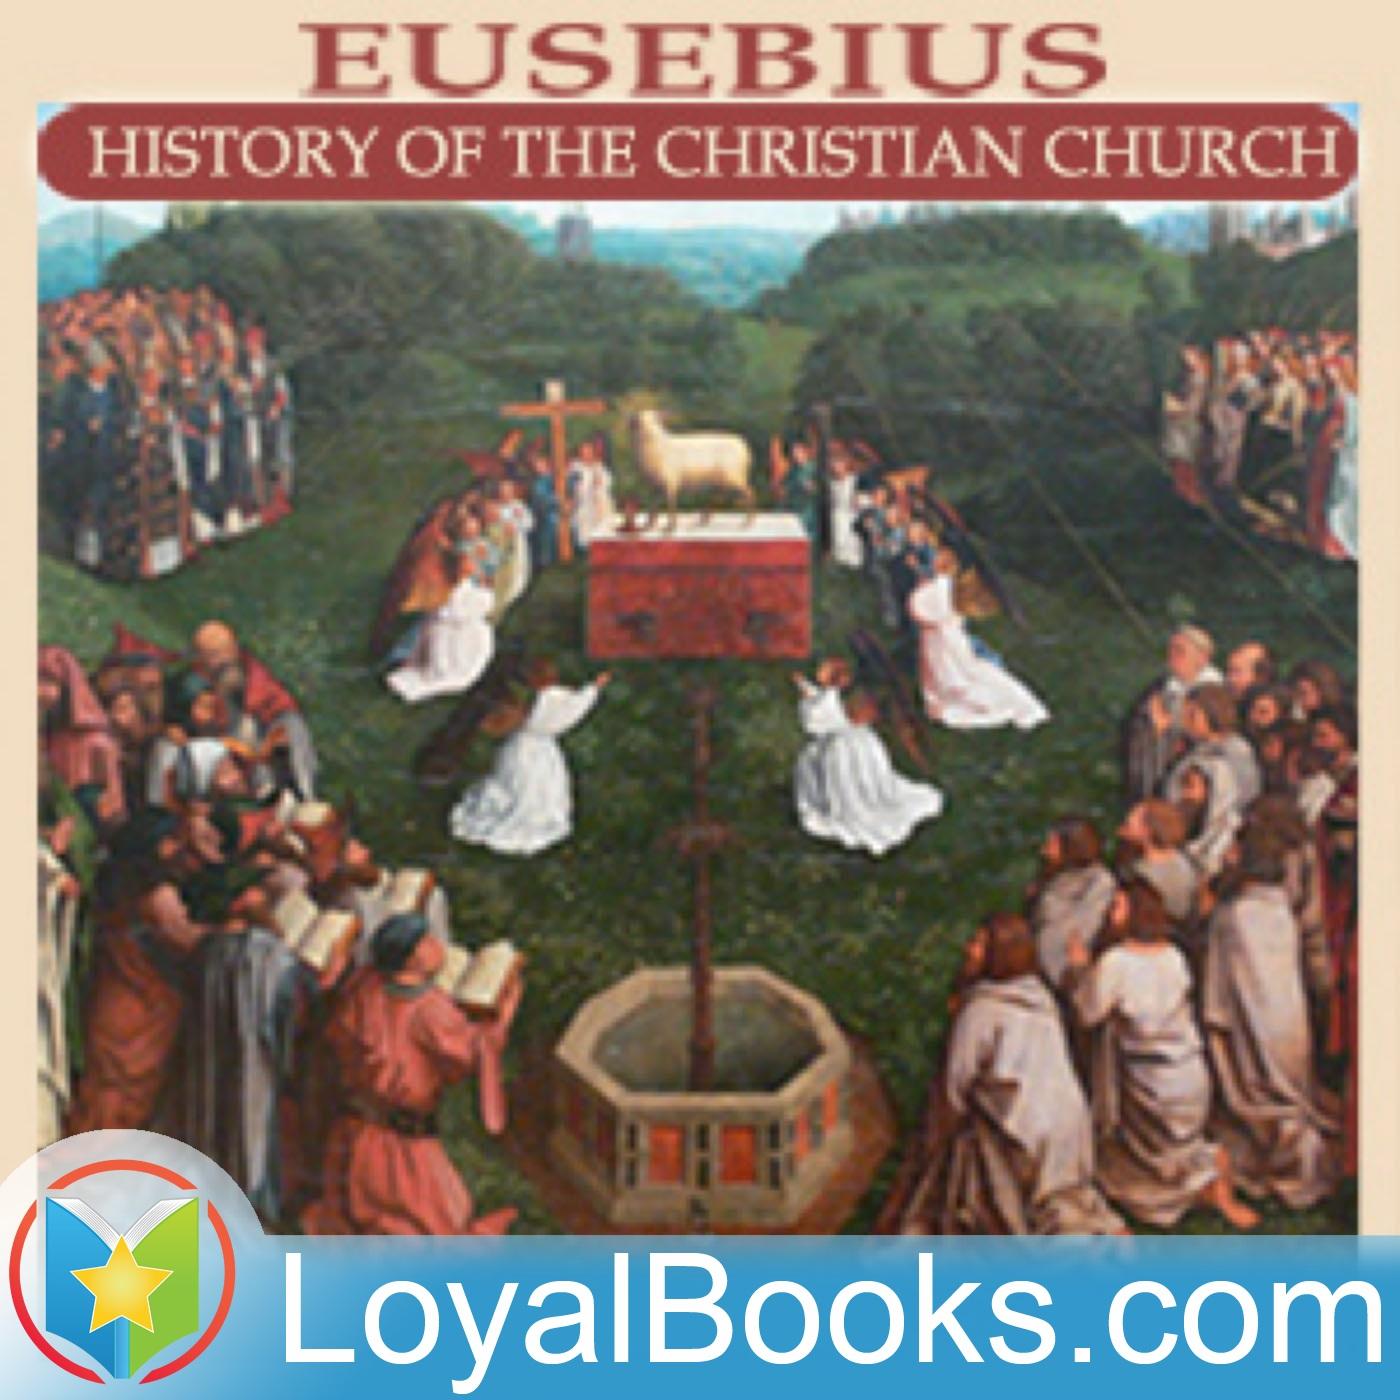 <![CDATA[Eusebius' History of the Christian Church by Eusebius of Caesarea]]>